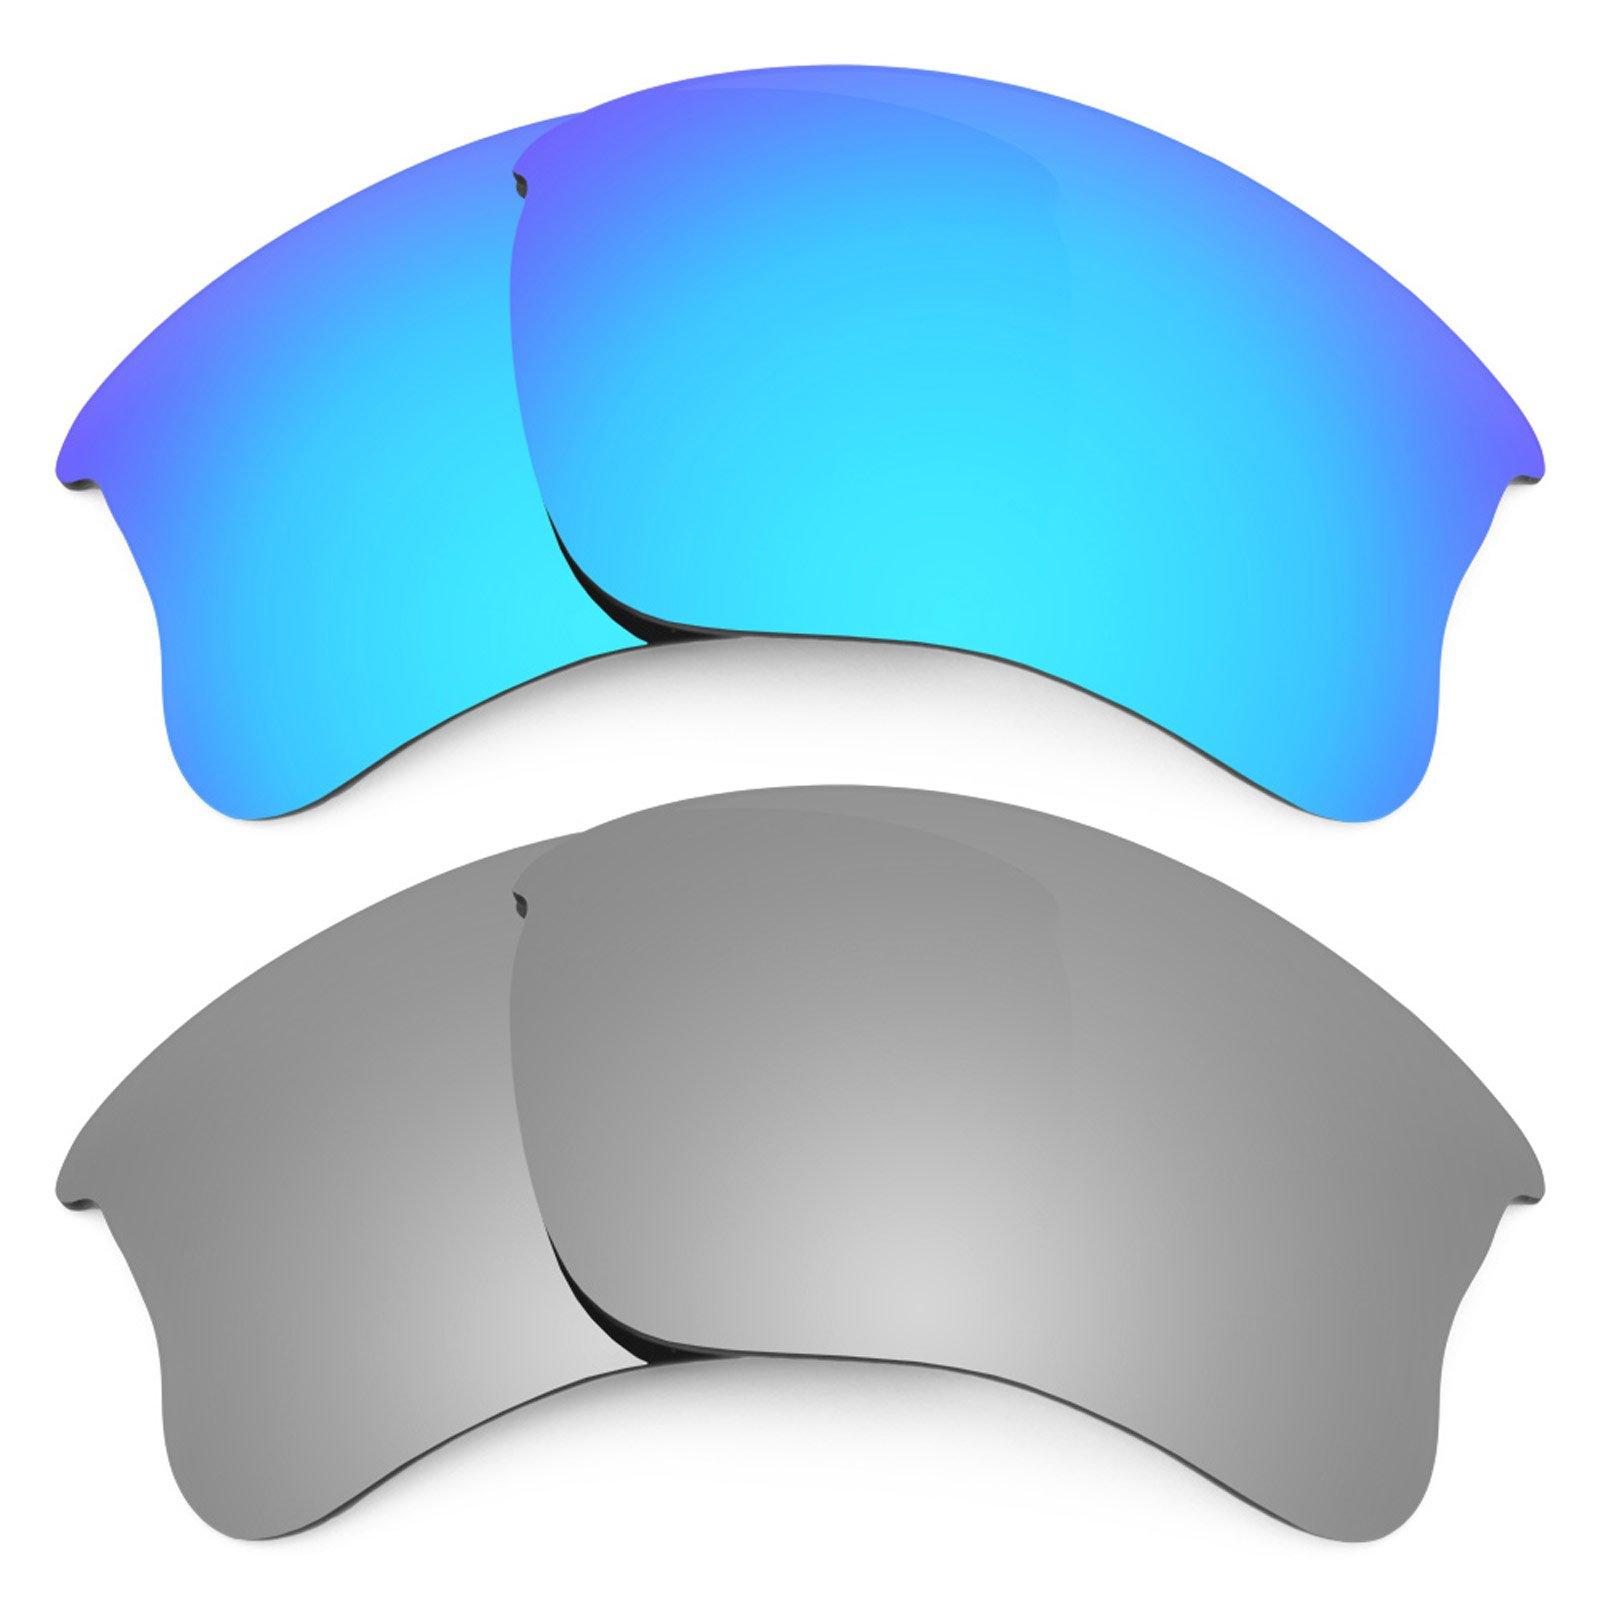 Revant Replacement Lenses for Oakley Flak Jacket XLJ 2 Pair Combo Pack K004